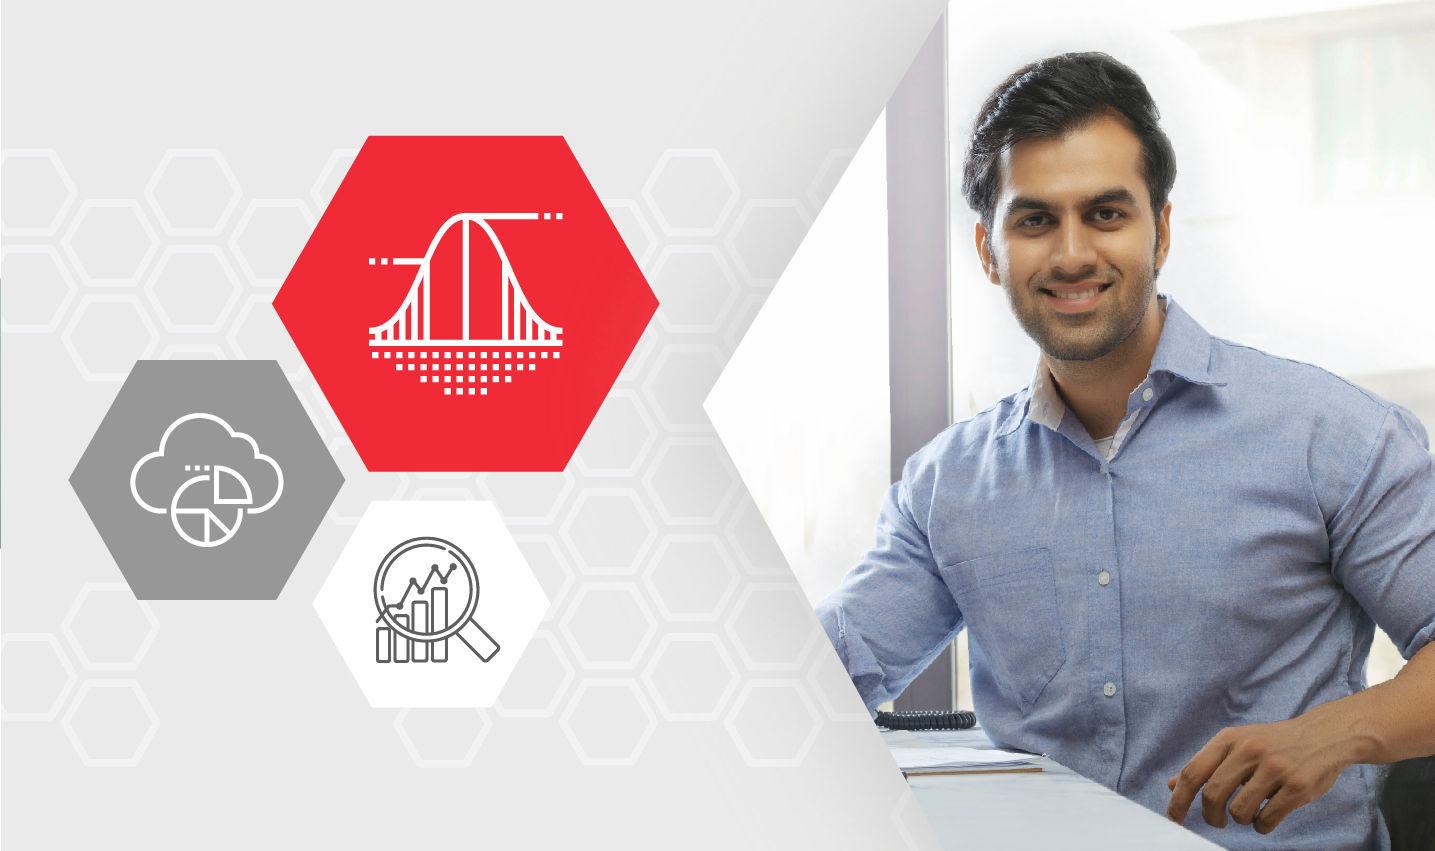 Executive Management Programme in Strategic Innovation, Digital Marketing & Business Analytics